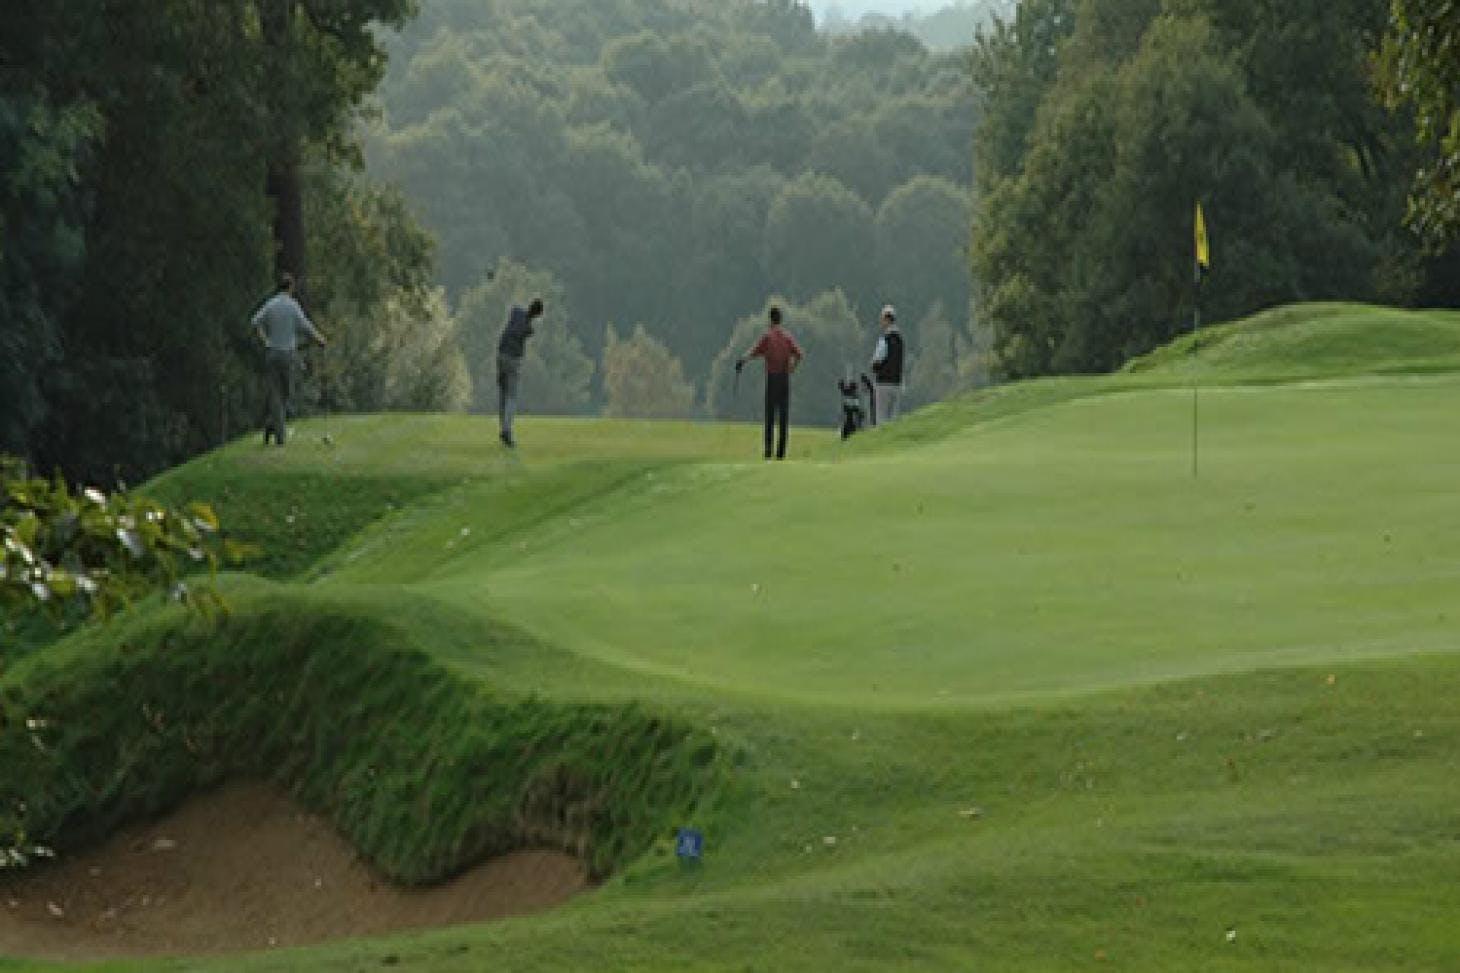 Royal Wimbledon Golf Club 18 hole golf course